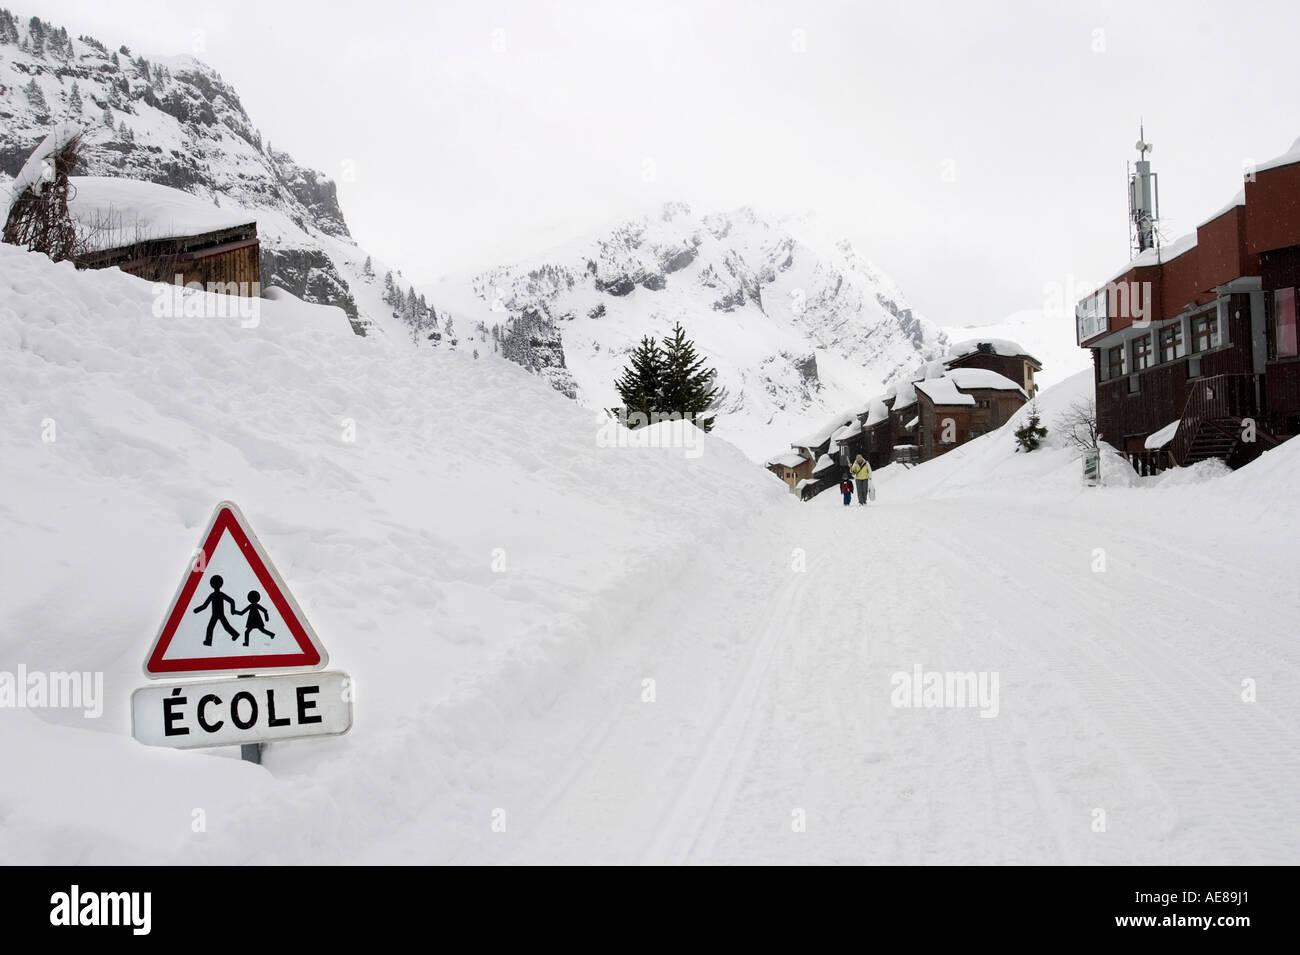 Snow covered street with school sign in Avoriaz, Morzine, Les Portes Du Soleil, Haute Savoie region, France, Europe. - Stock Image